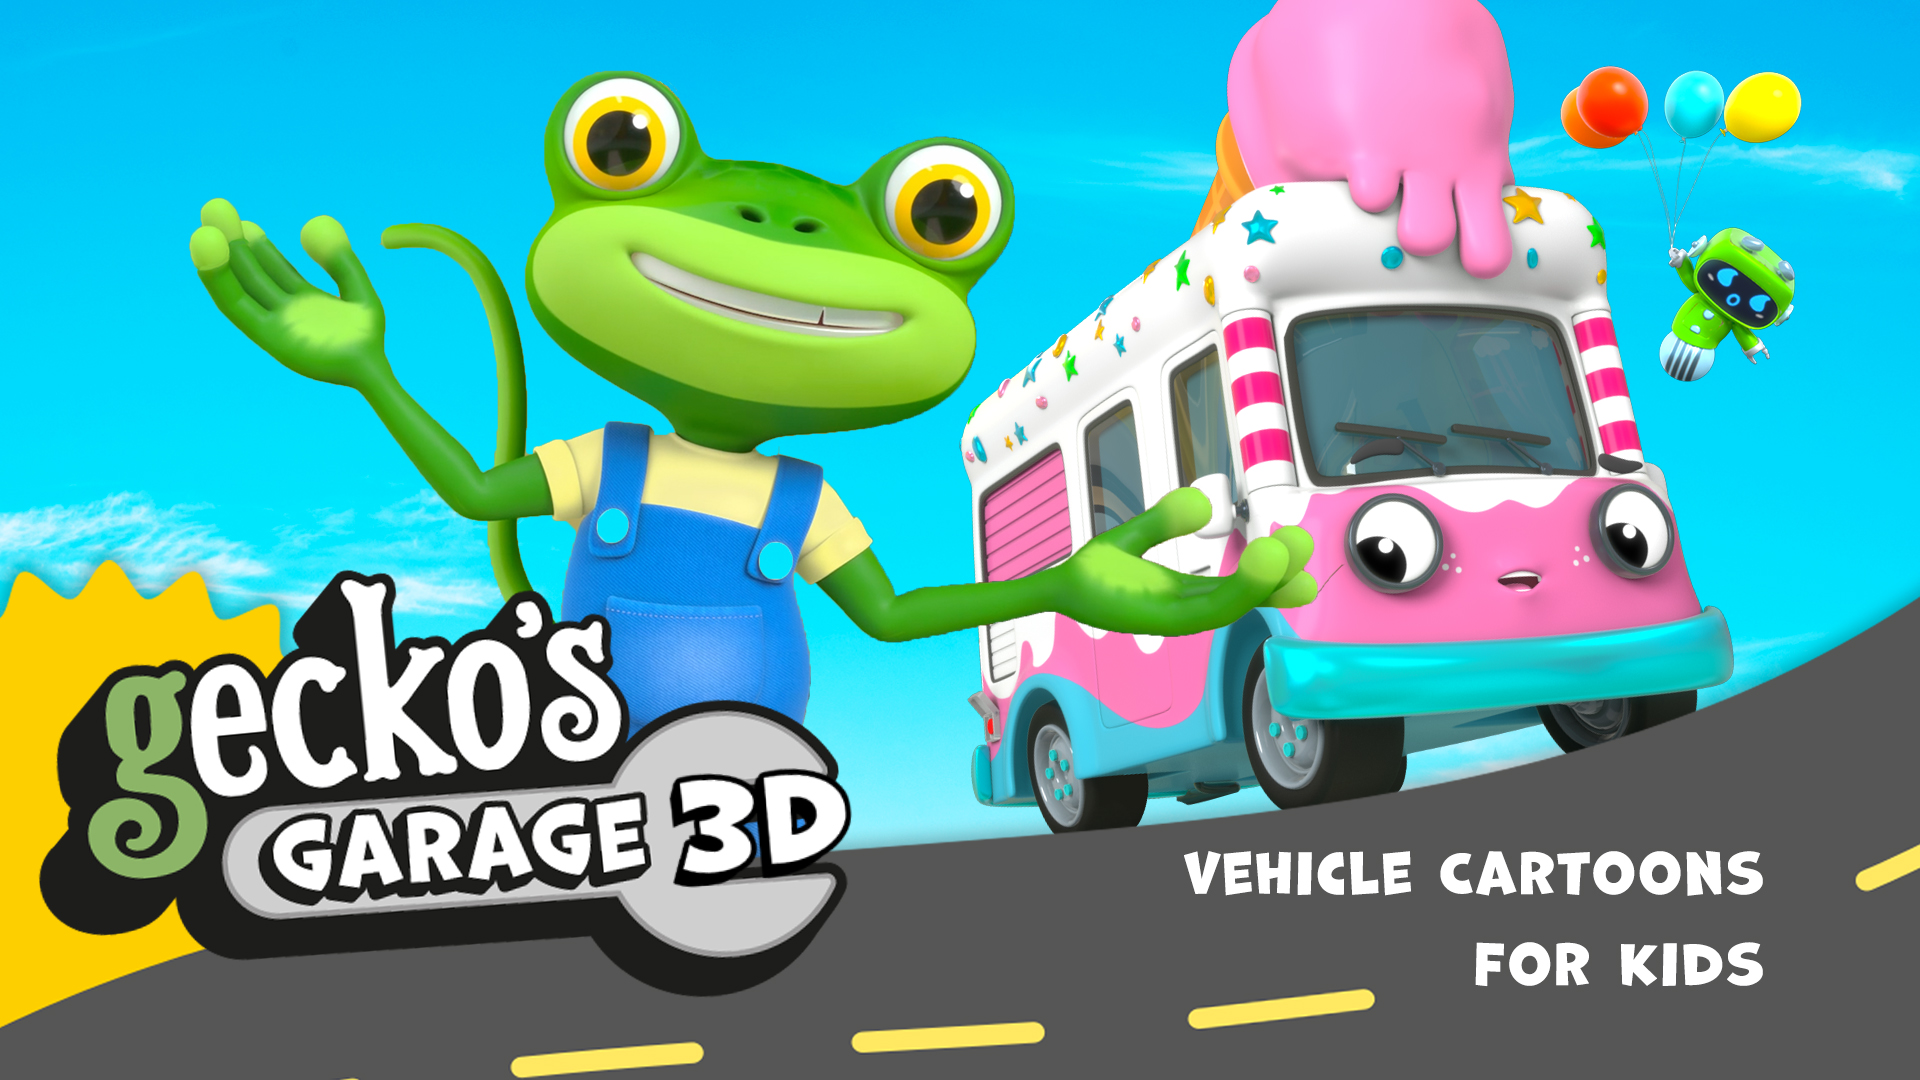 Gecko's Garage 3D - Vehicle Cartoons for Kids - Season 1